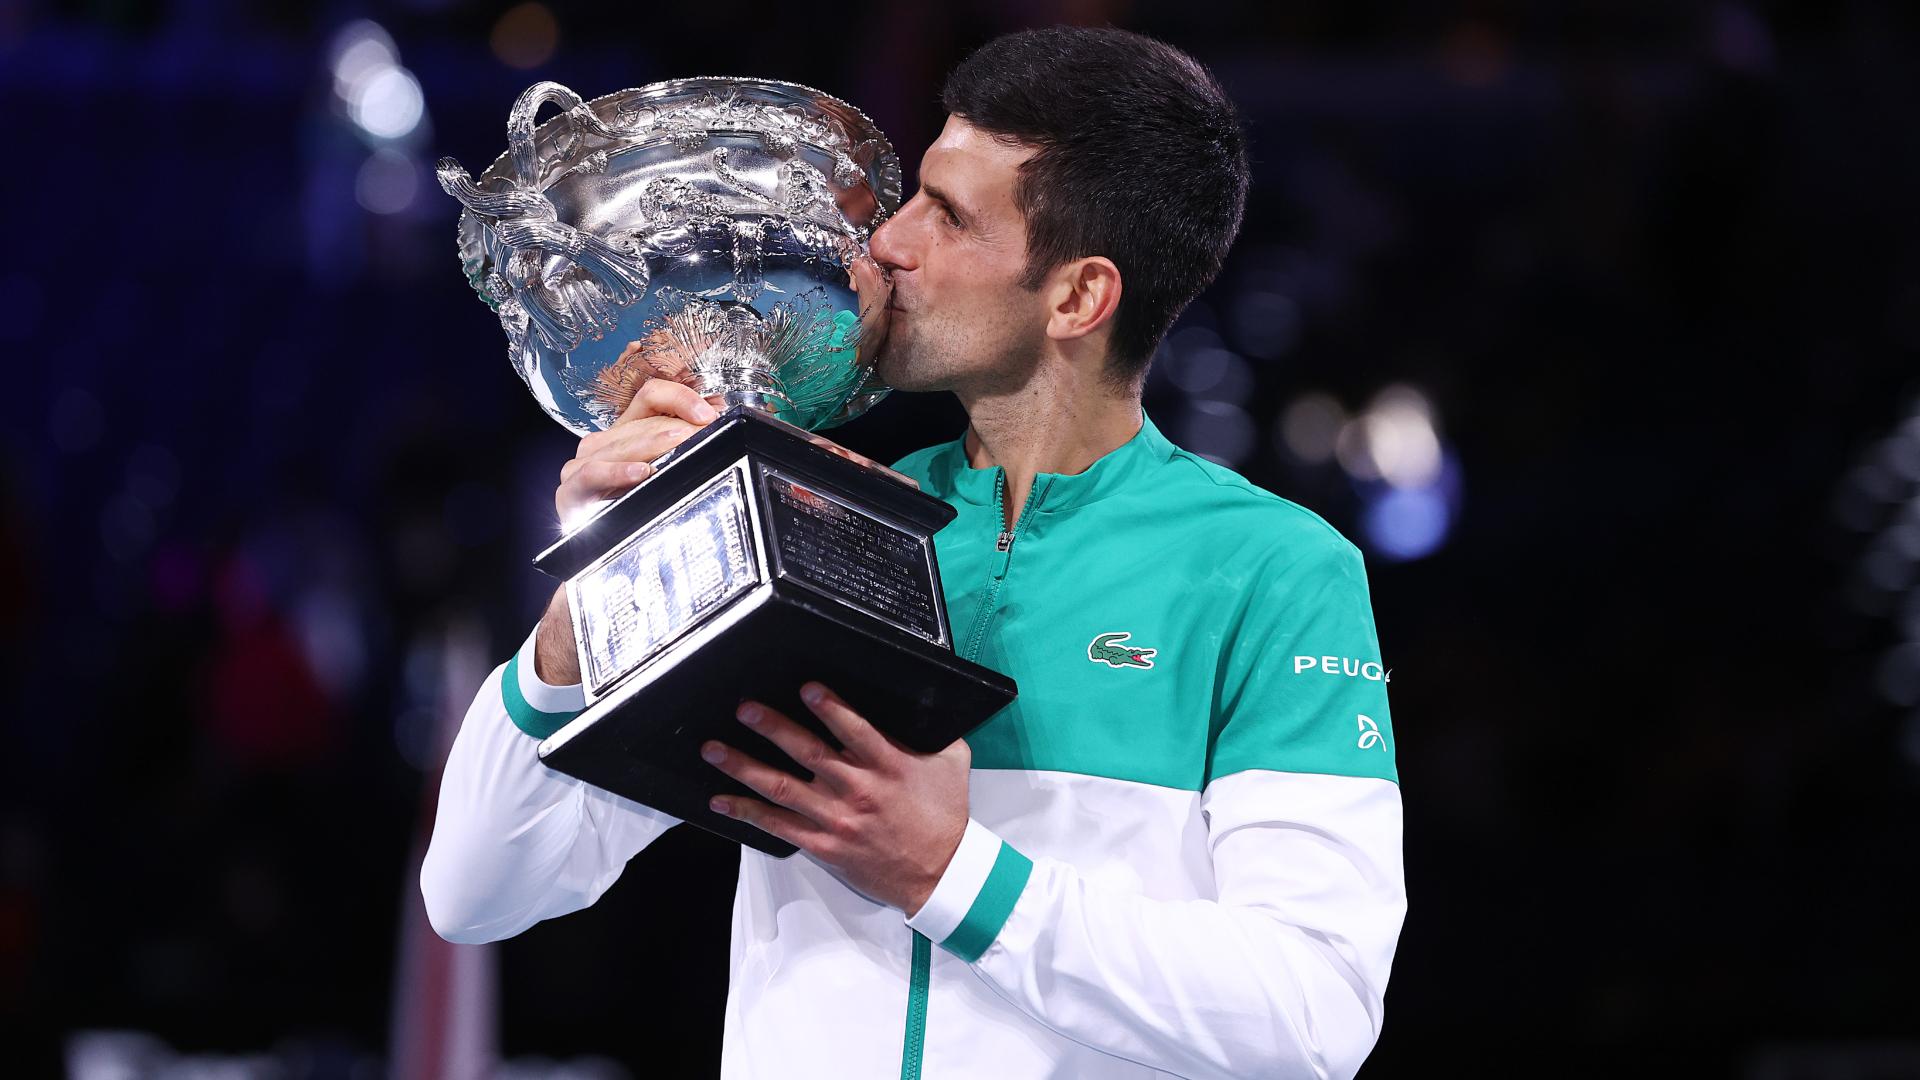 We take a look back at all nine of Novak Djokovic's Australian Open titles.